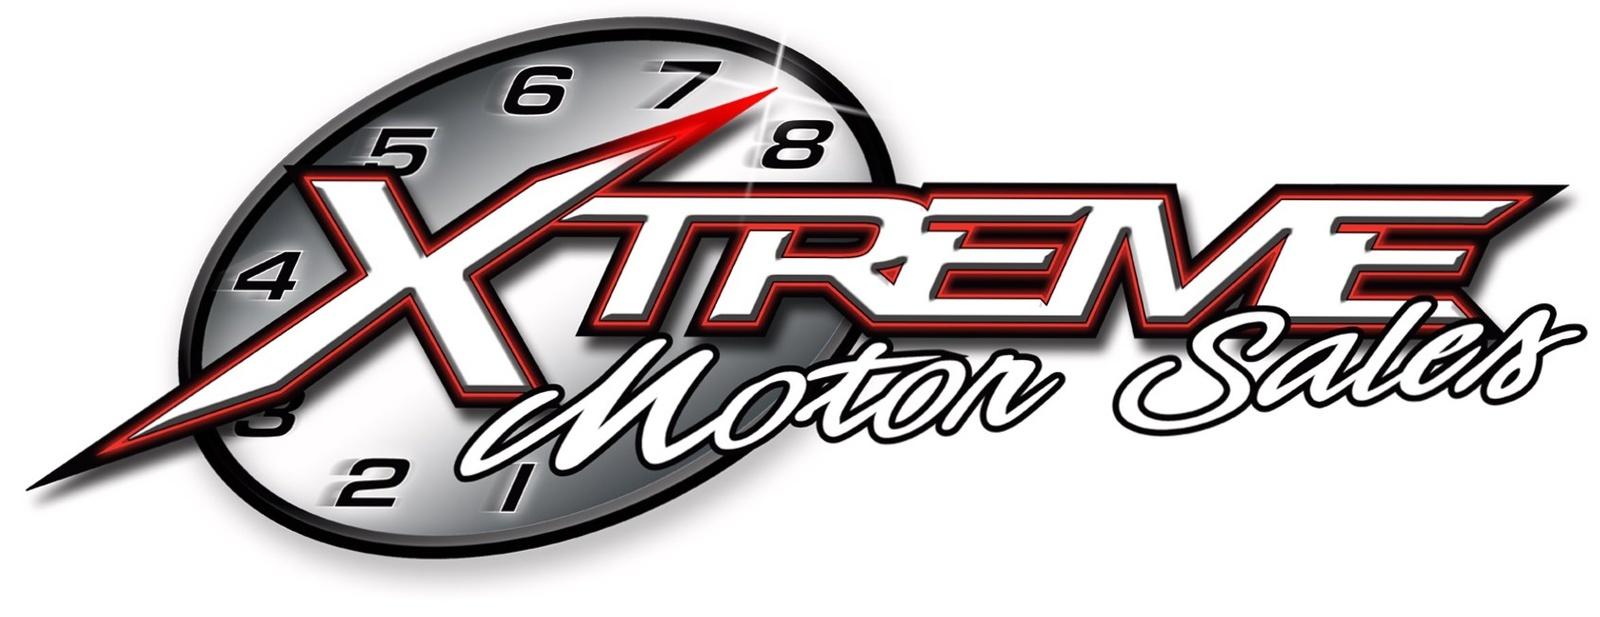 Xtreme Motor Sales Addison Il Read Consumer Reviews